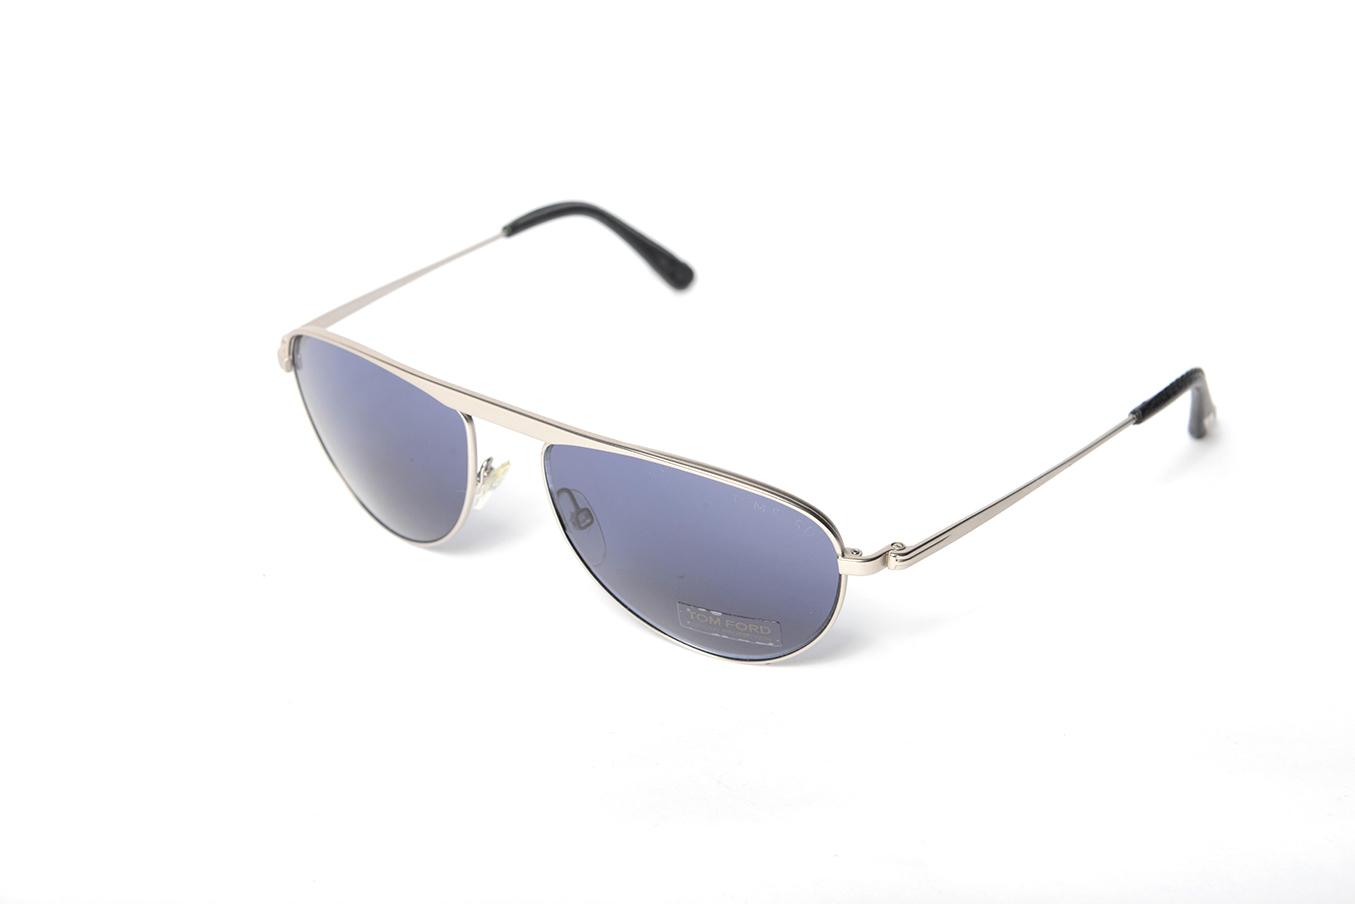 5863eea69b Tom ford TF108 James Bond 007 Sunglasses - Piccadilly Opticians -